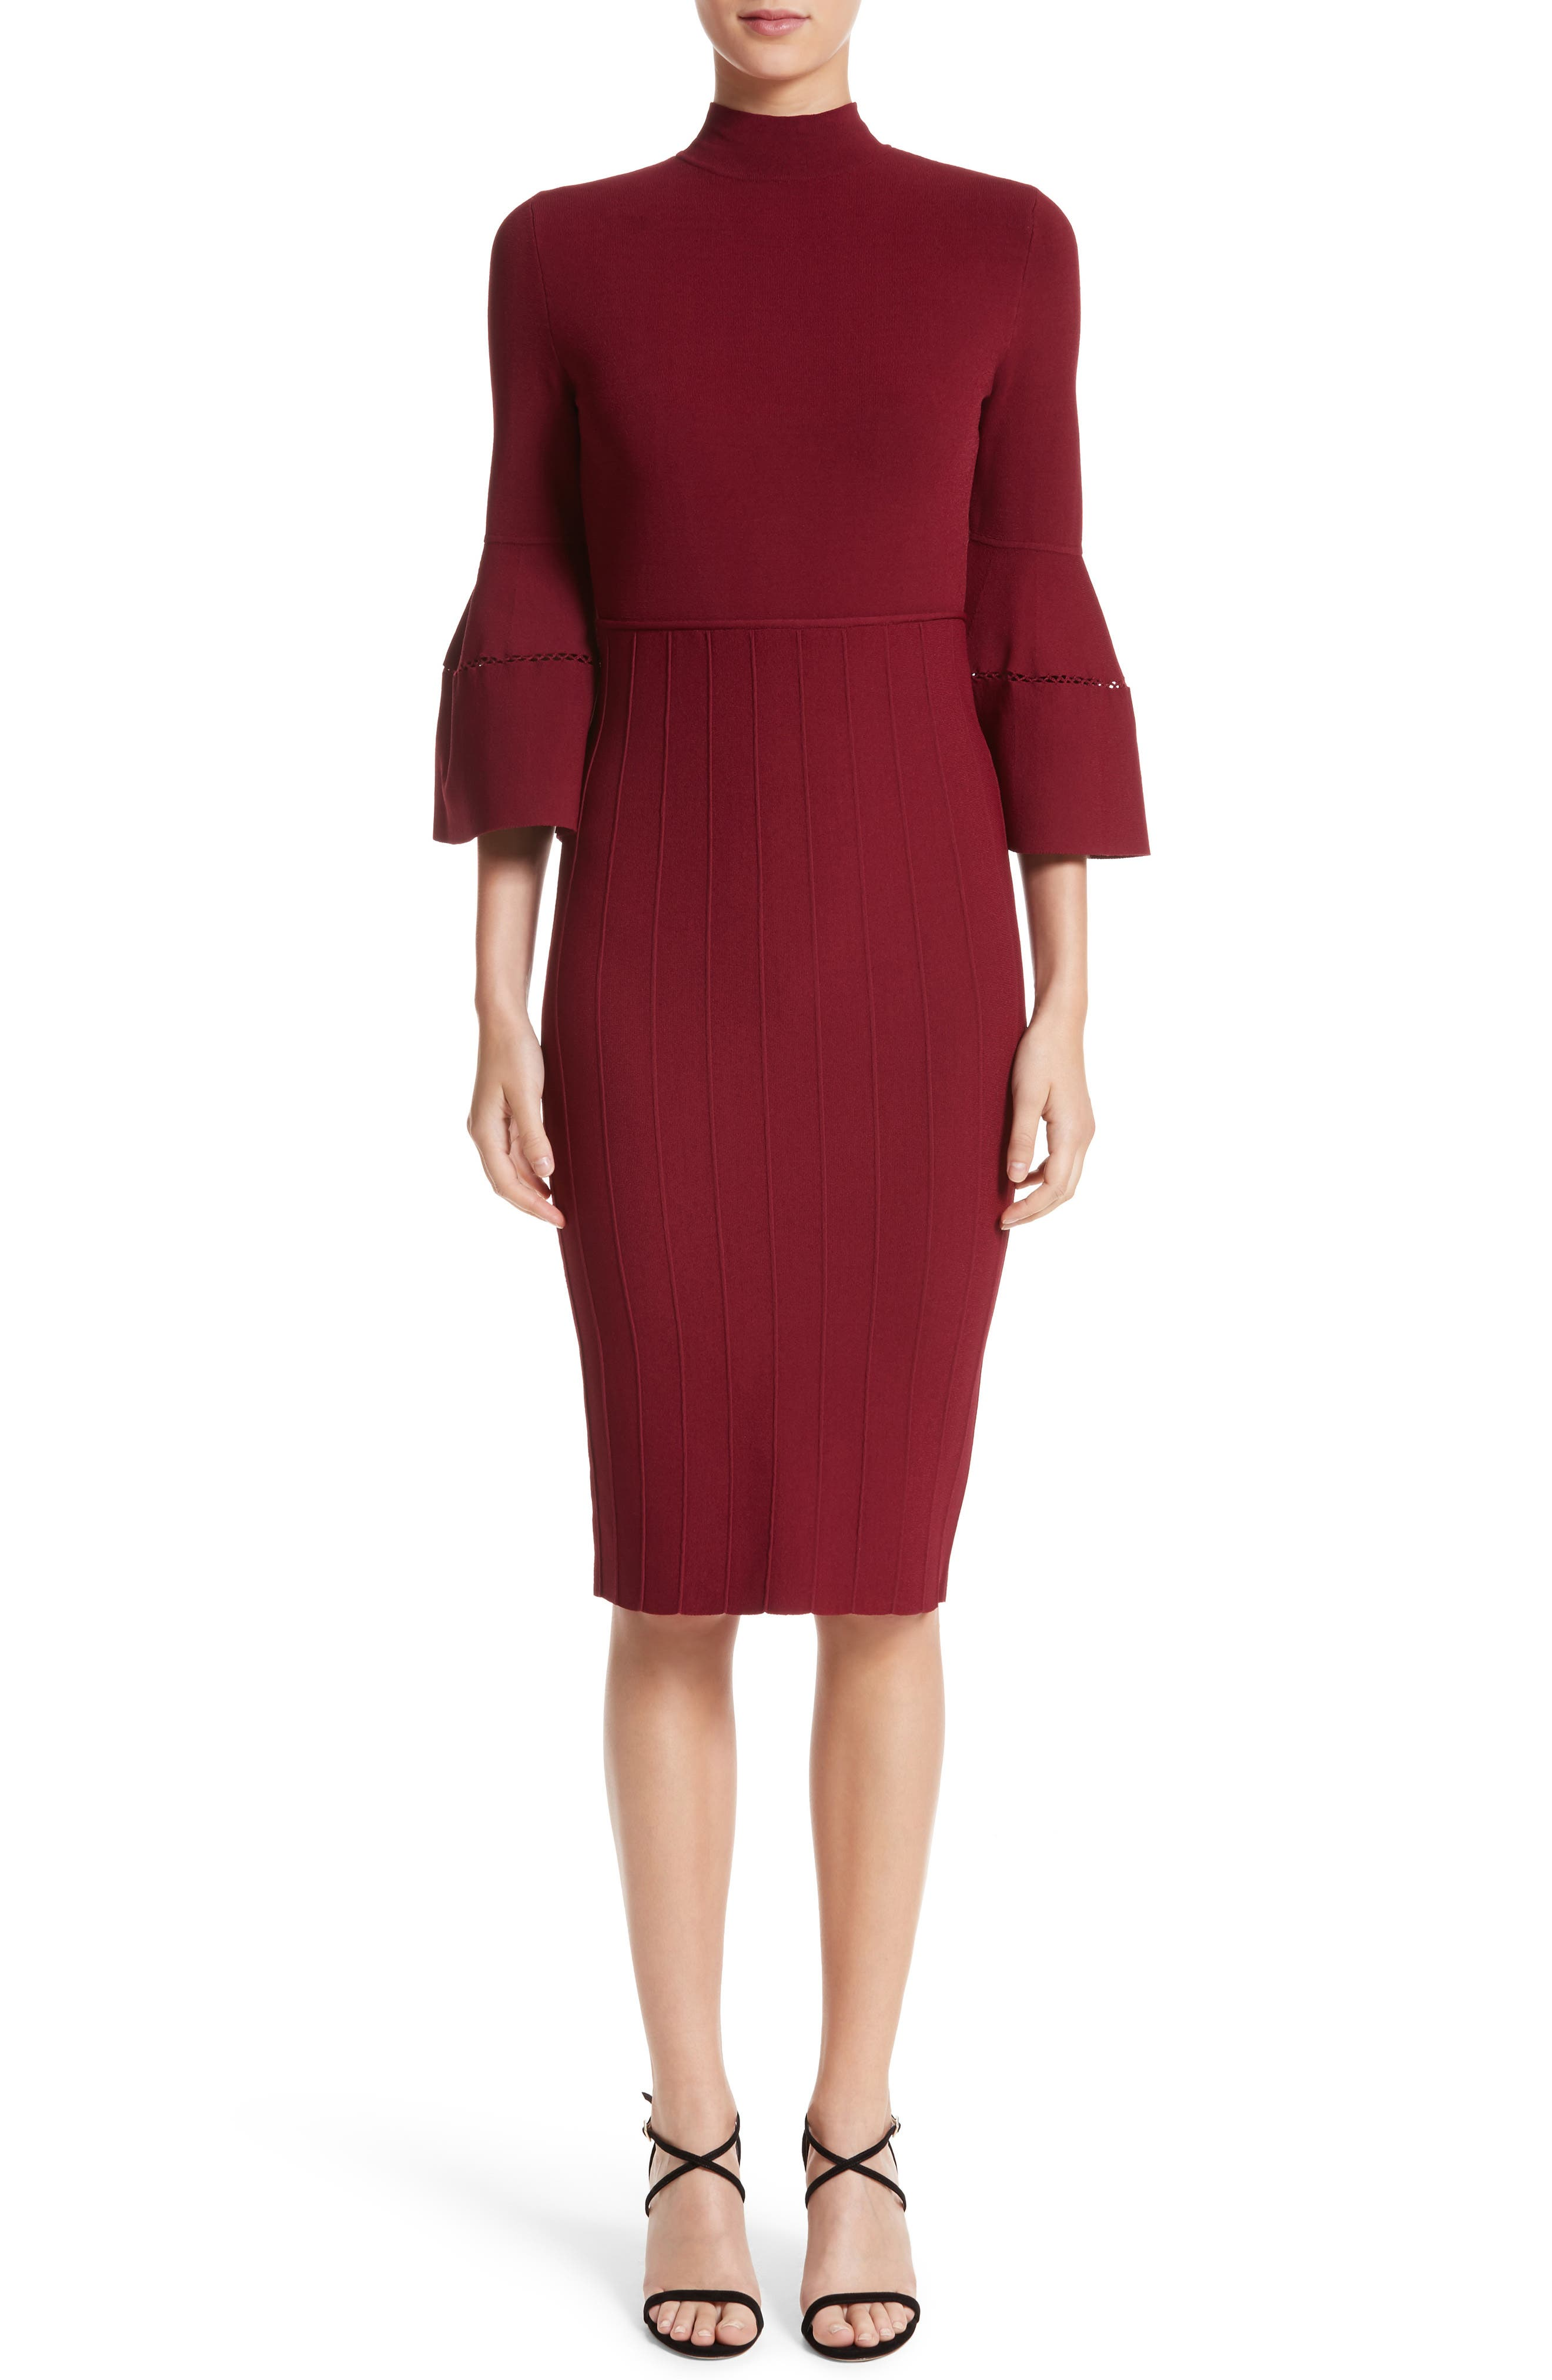 Alternate Image 1 Selected - Lela Rose Knit Bell Sleeve Dress